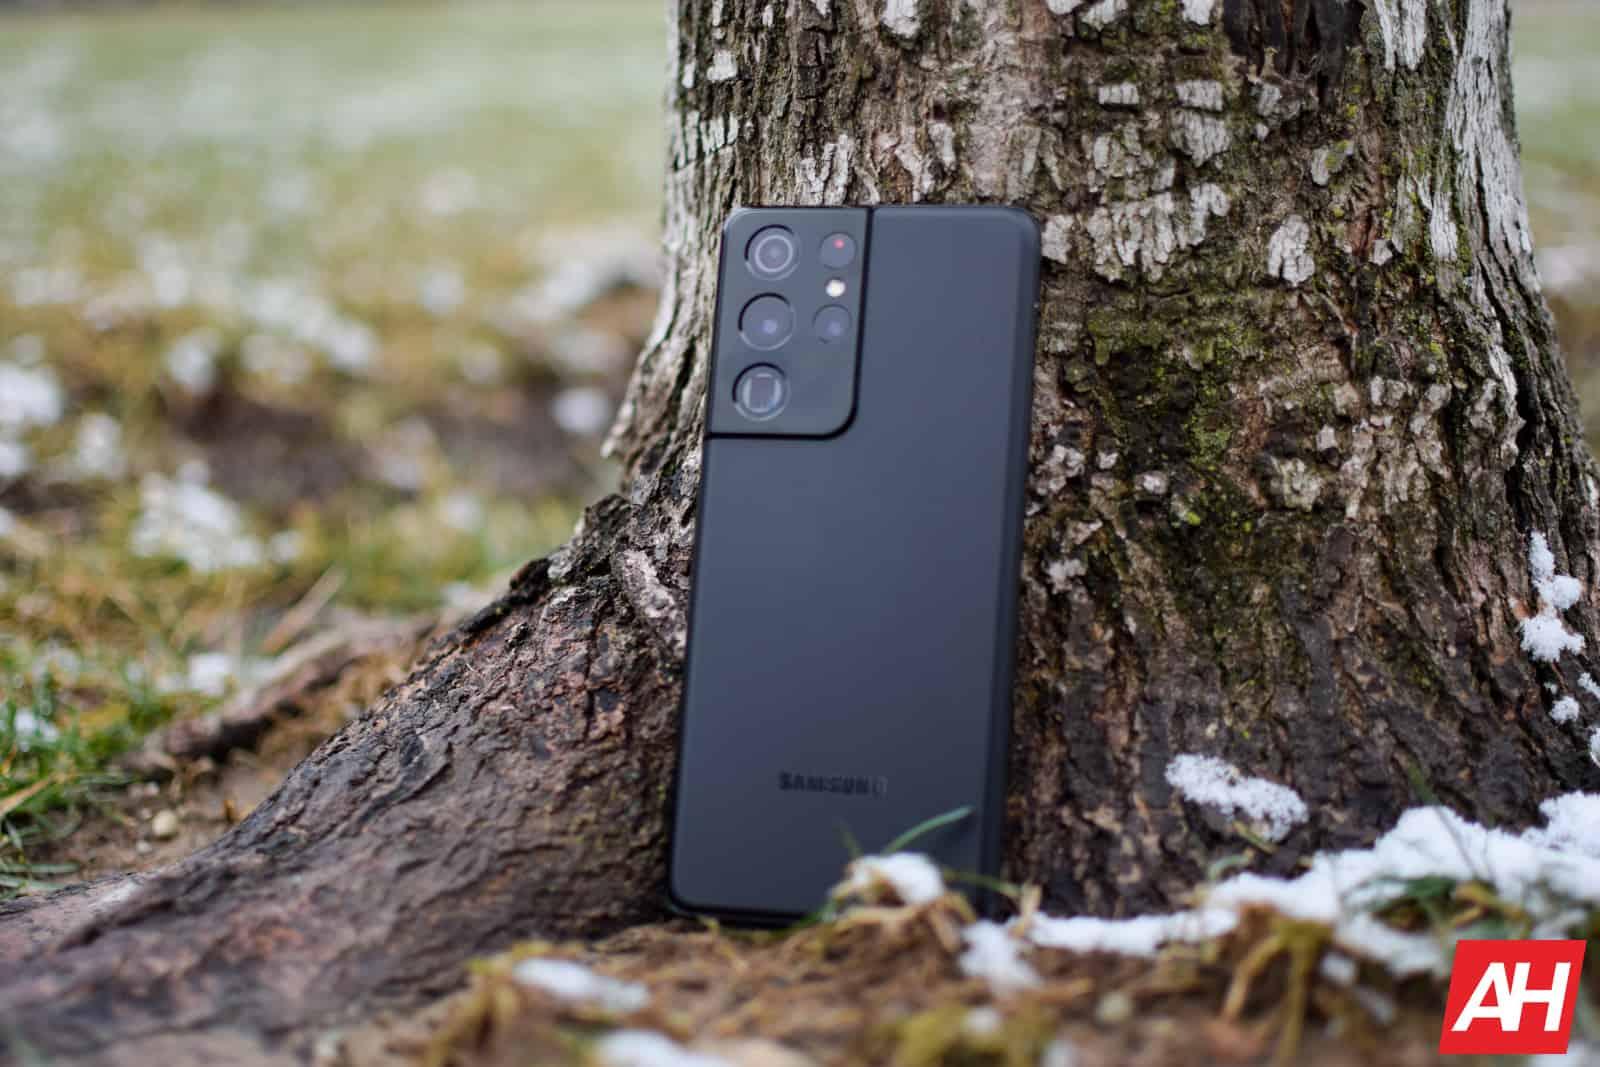 Top 10 Best Android Smartphones, Vectribe